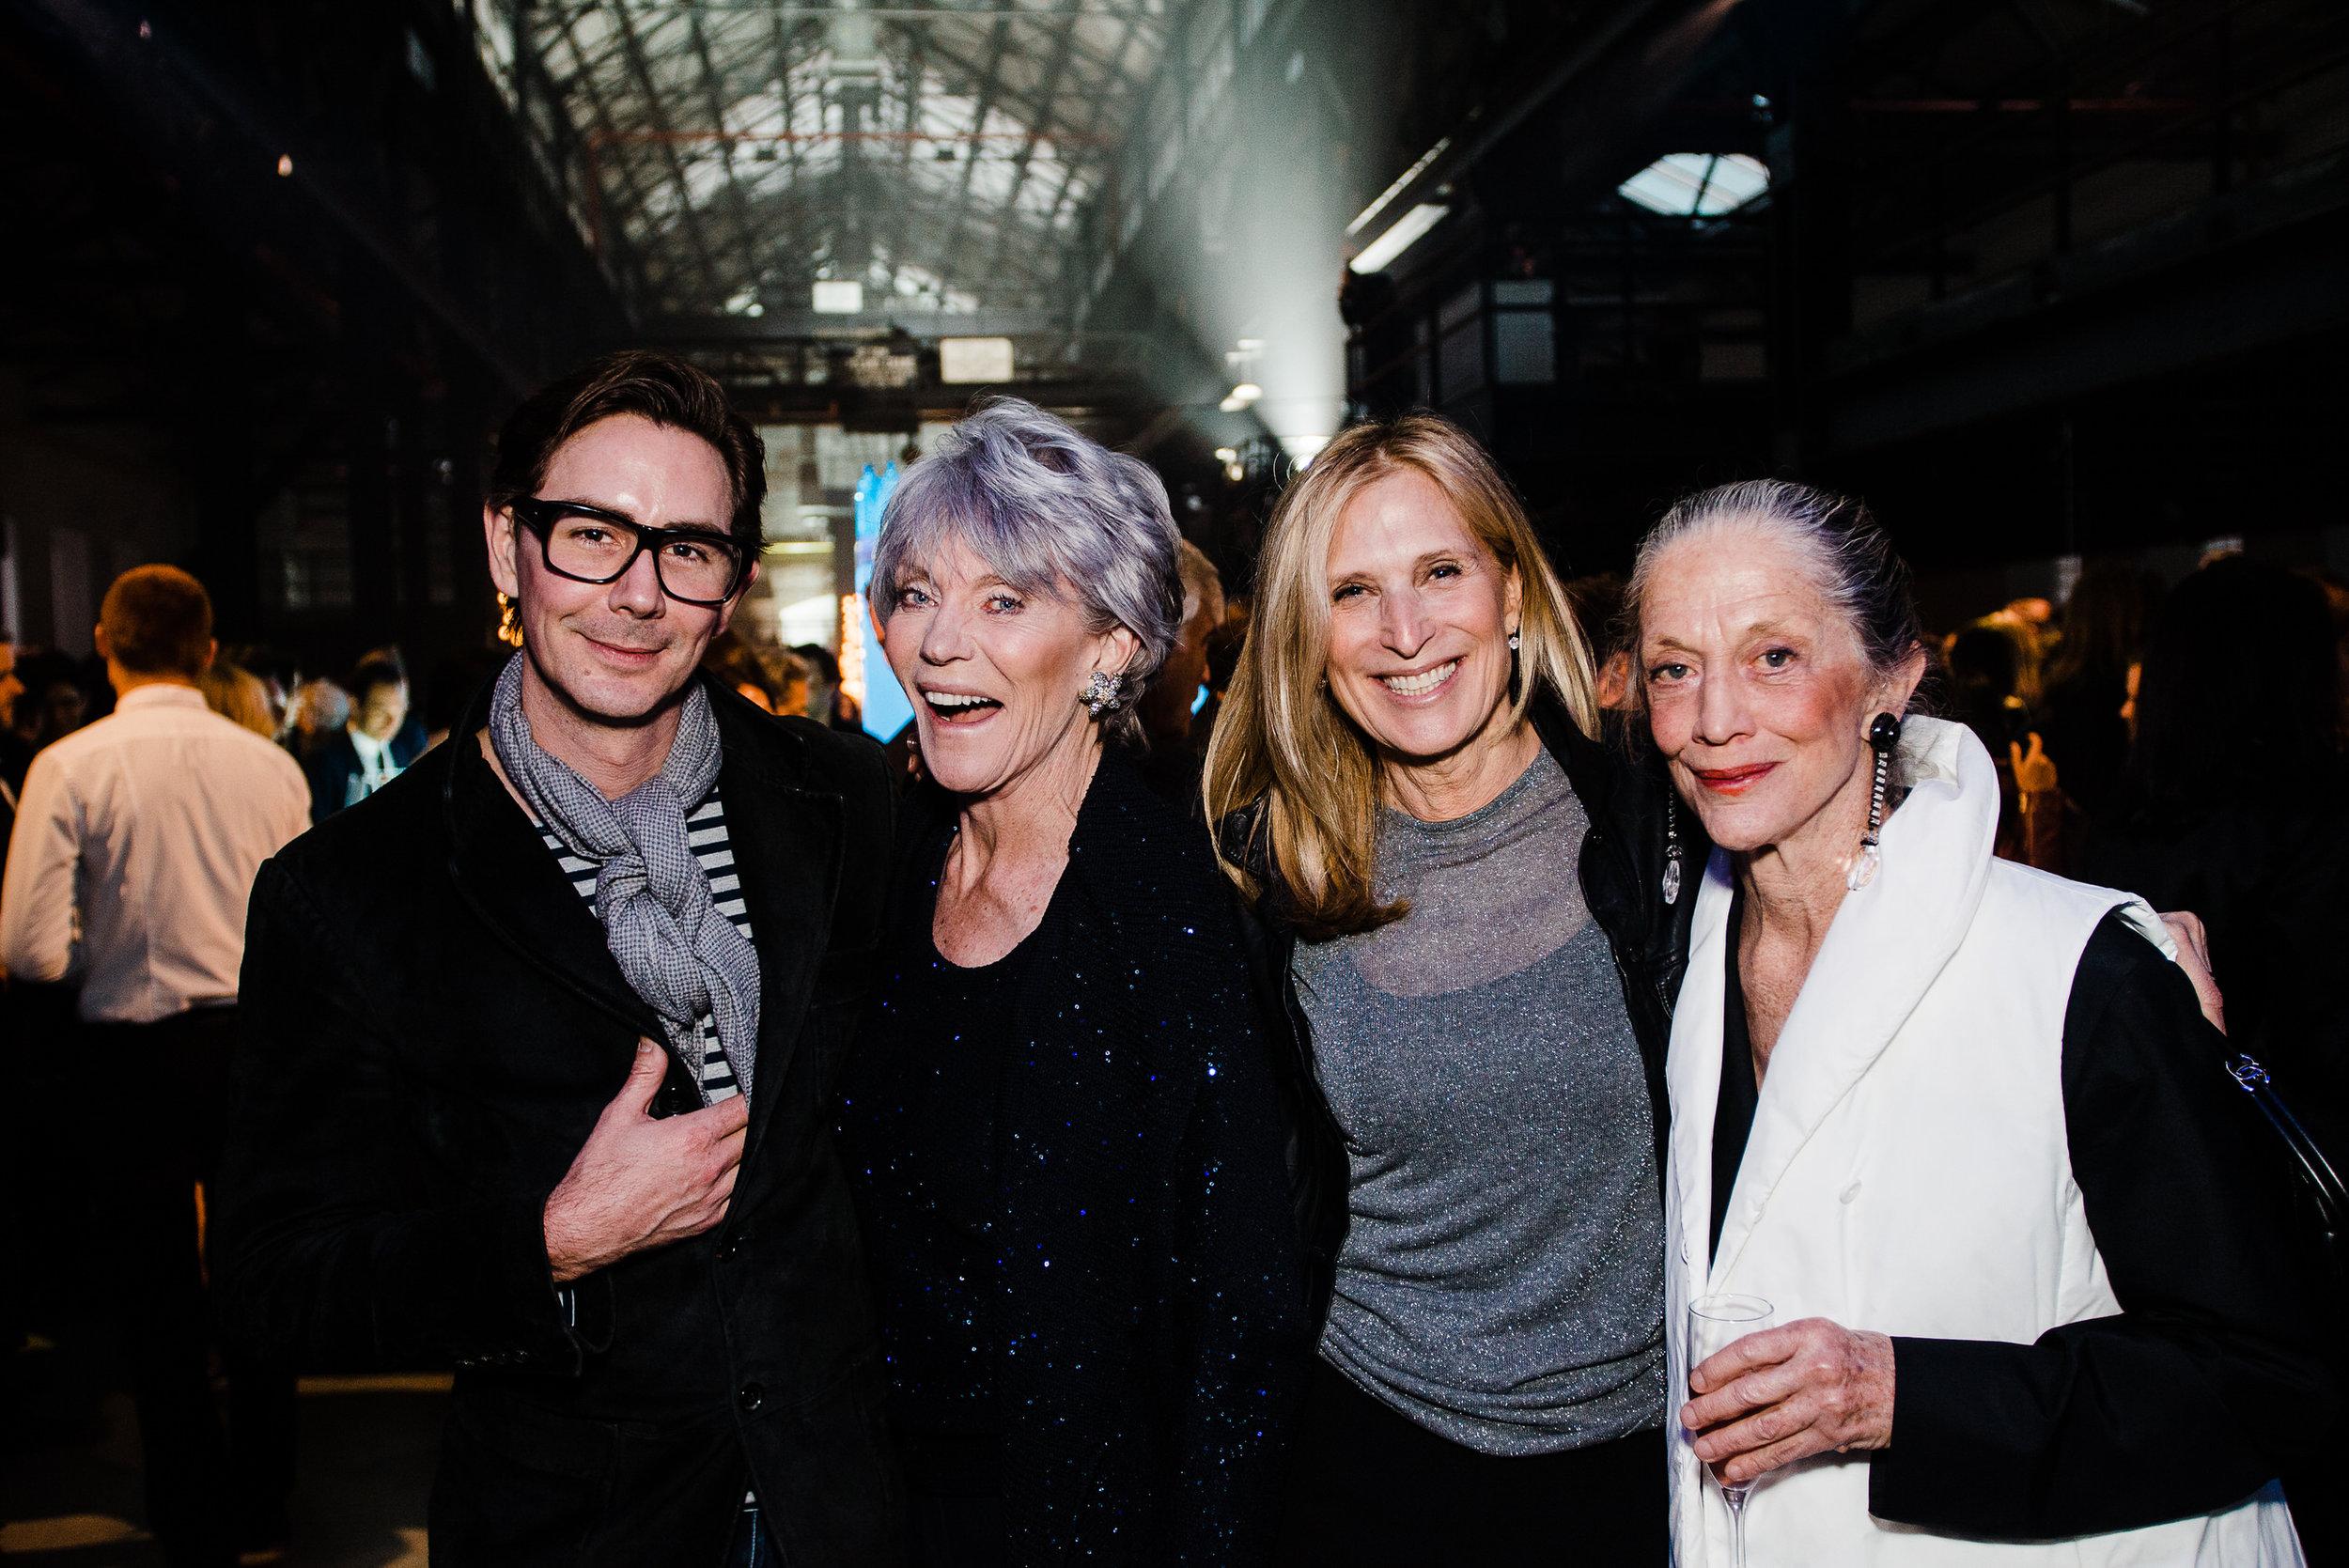 Susan Calhoun, Mayer Prince, Suzanne Cochran (9176999579) and Tim Rogers at Creativetime Gala at Brooklyn Navy Yards